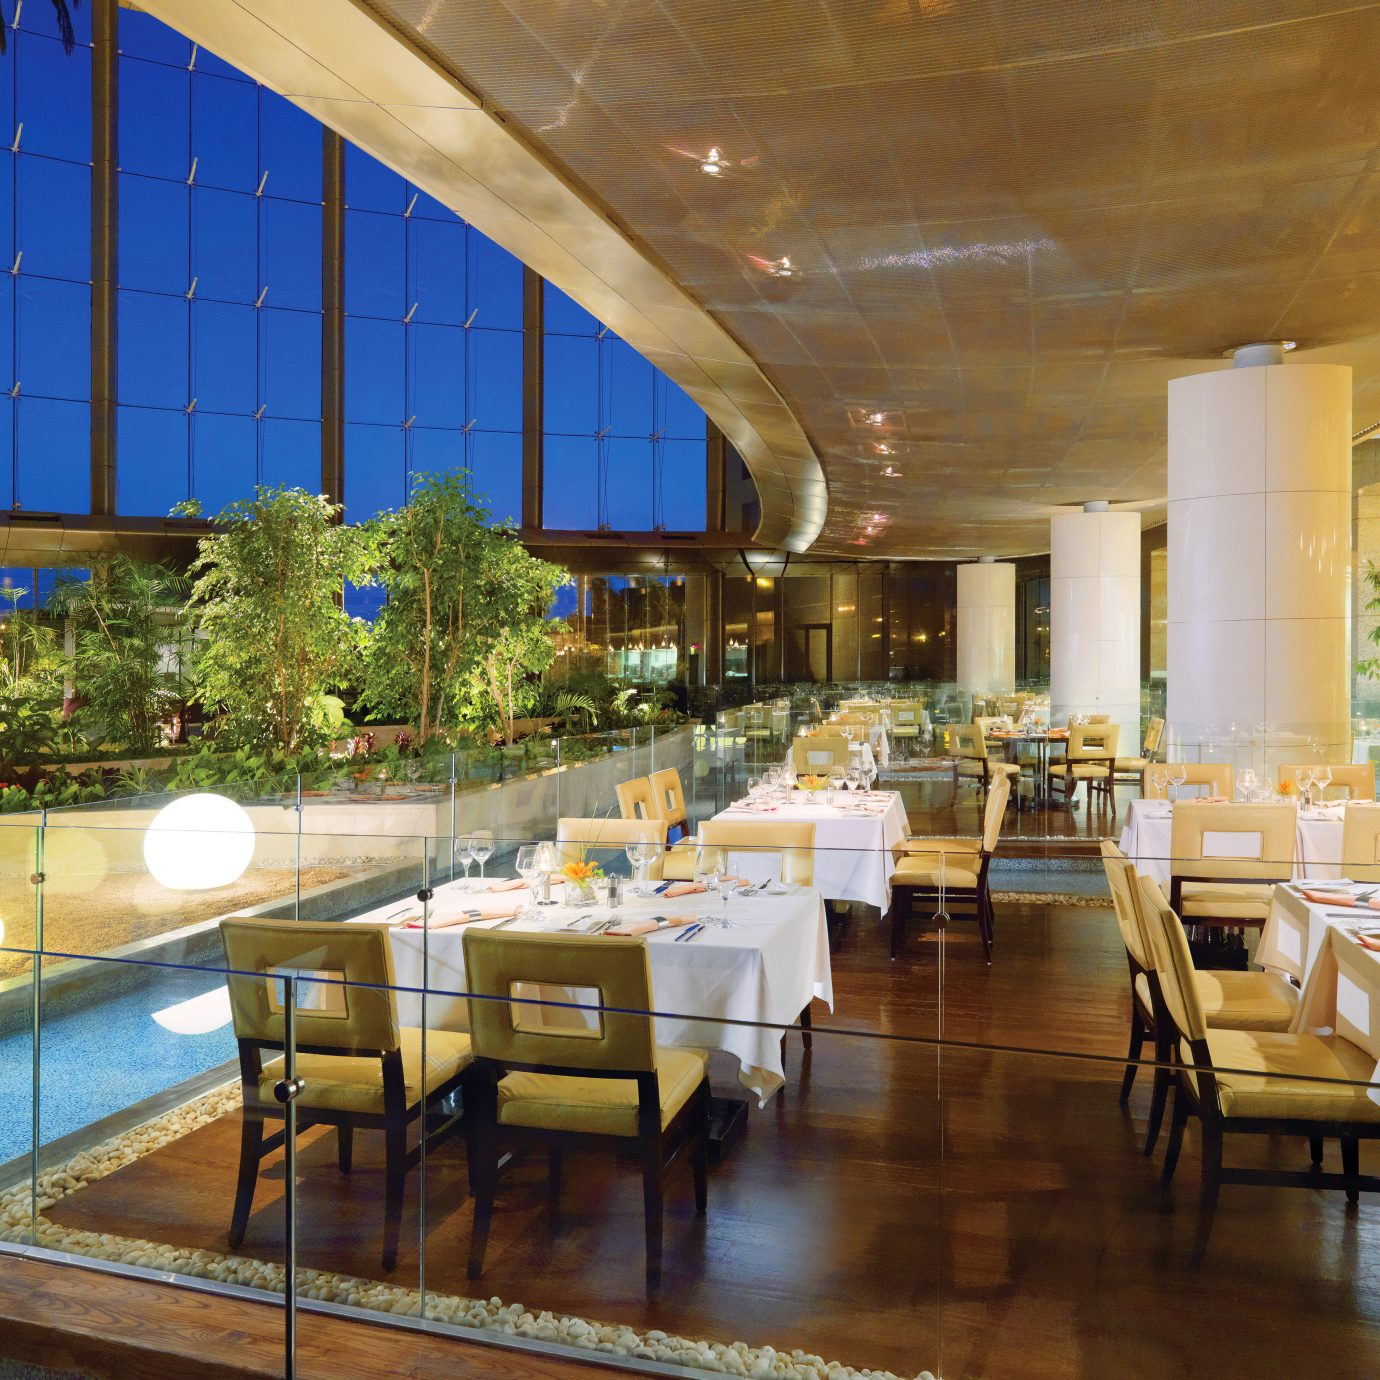 Dining Drink Modern Scenic views Lobby restaurant function hall Resort convention center condominium ballroom palace